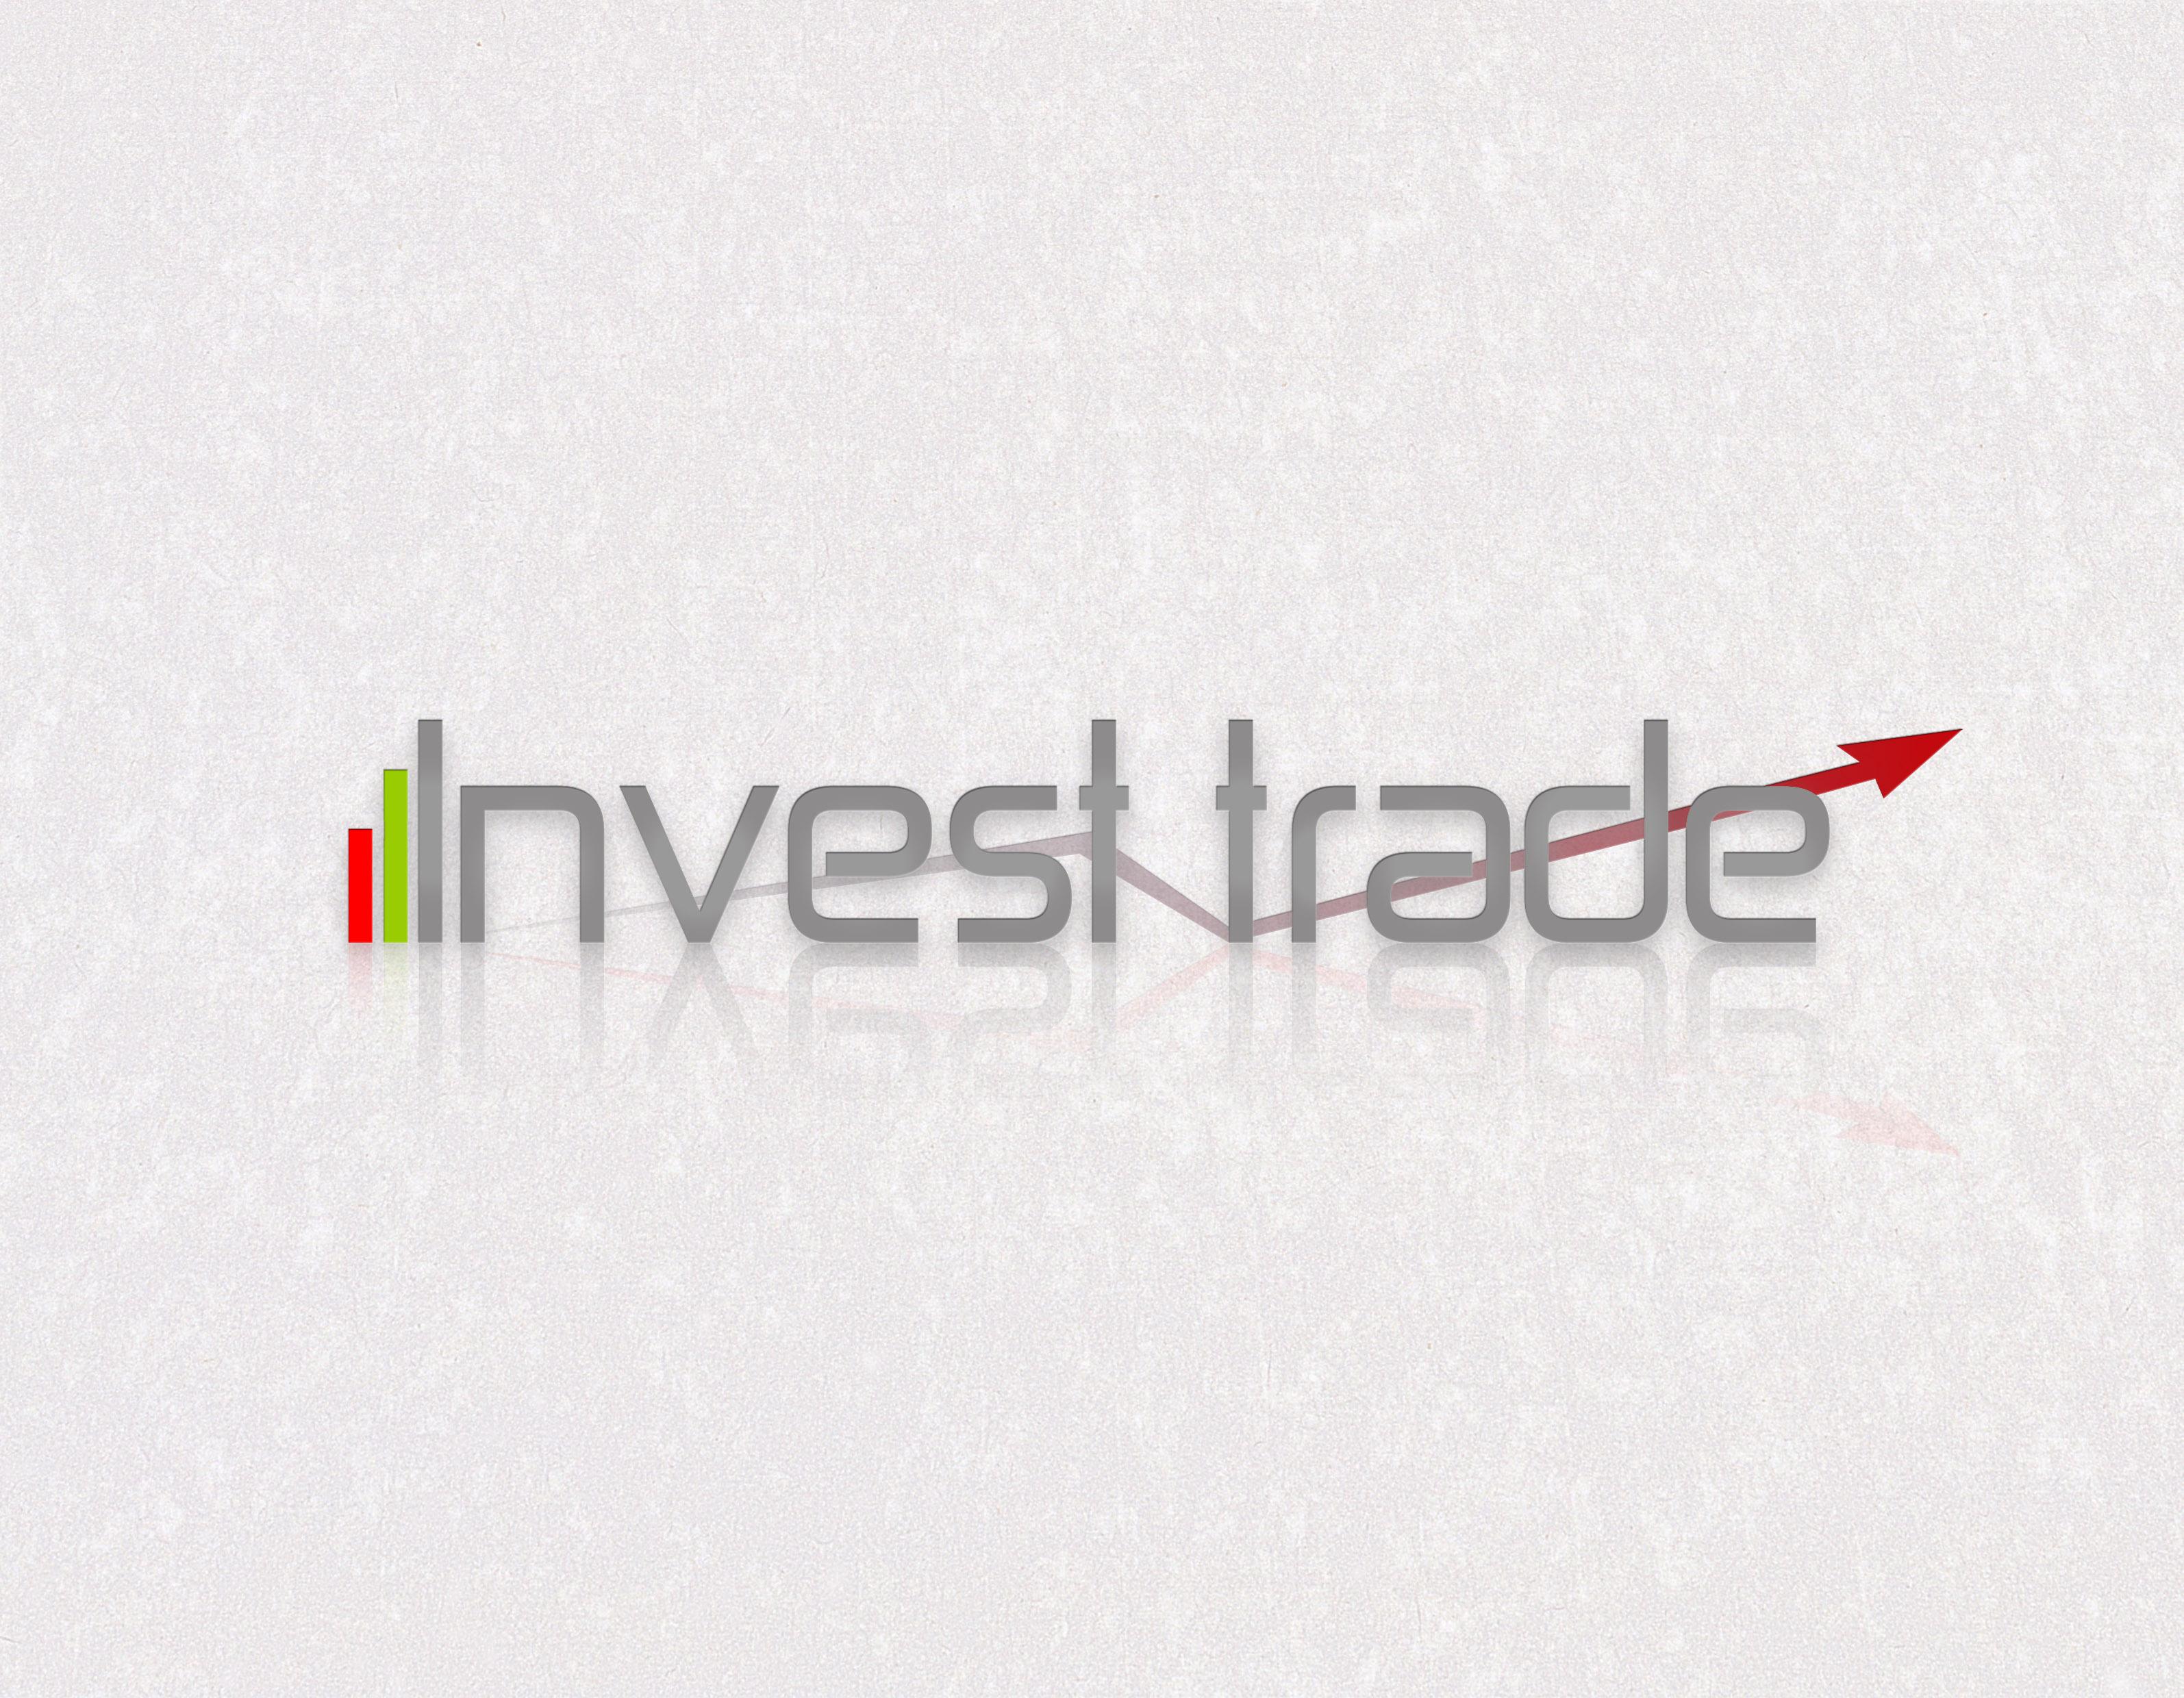 Разработка логотипа для компании Invest trade фото f_9995121e30839ec8.jpg